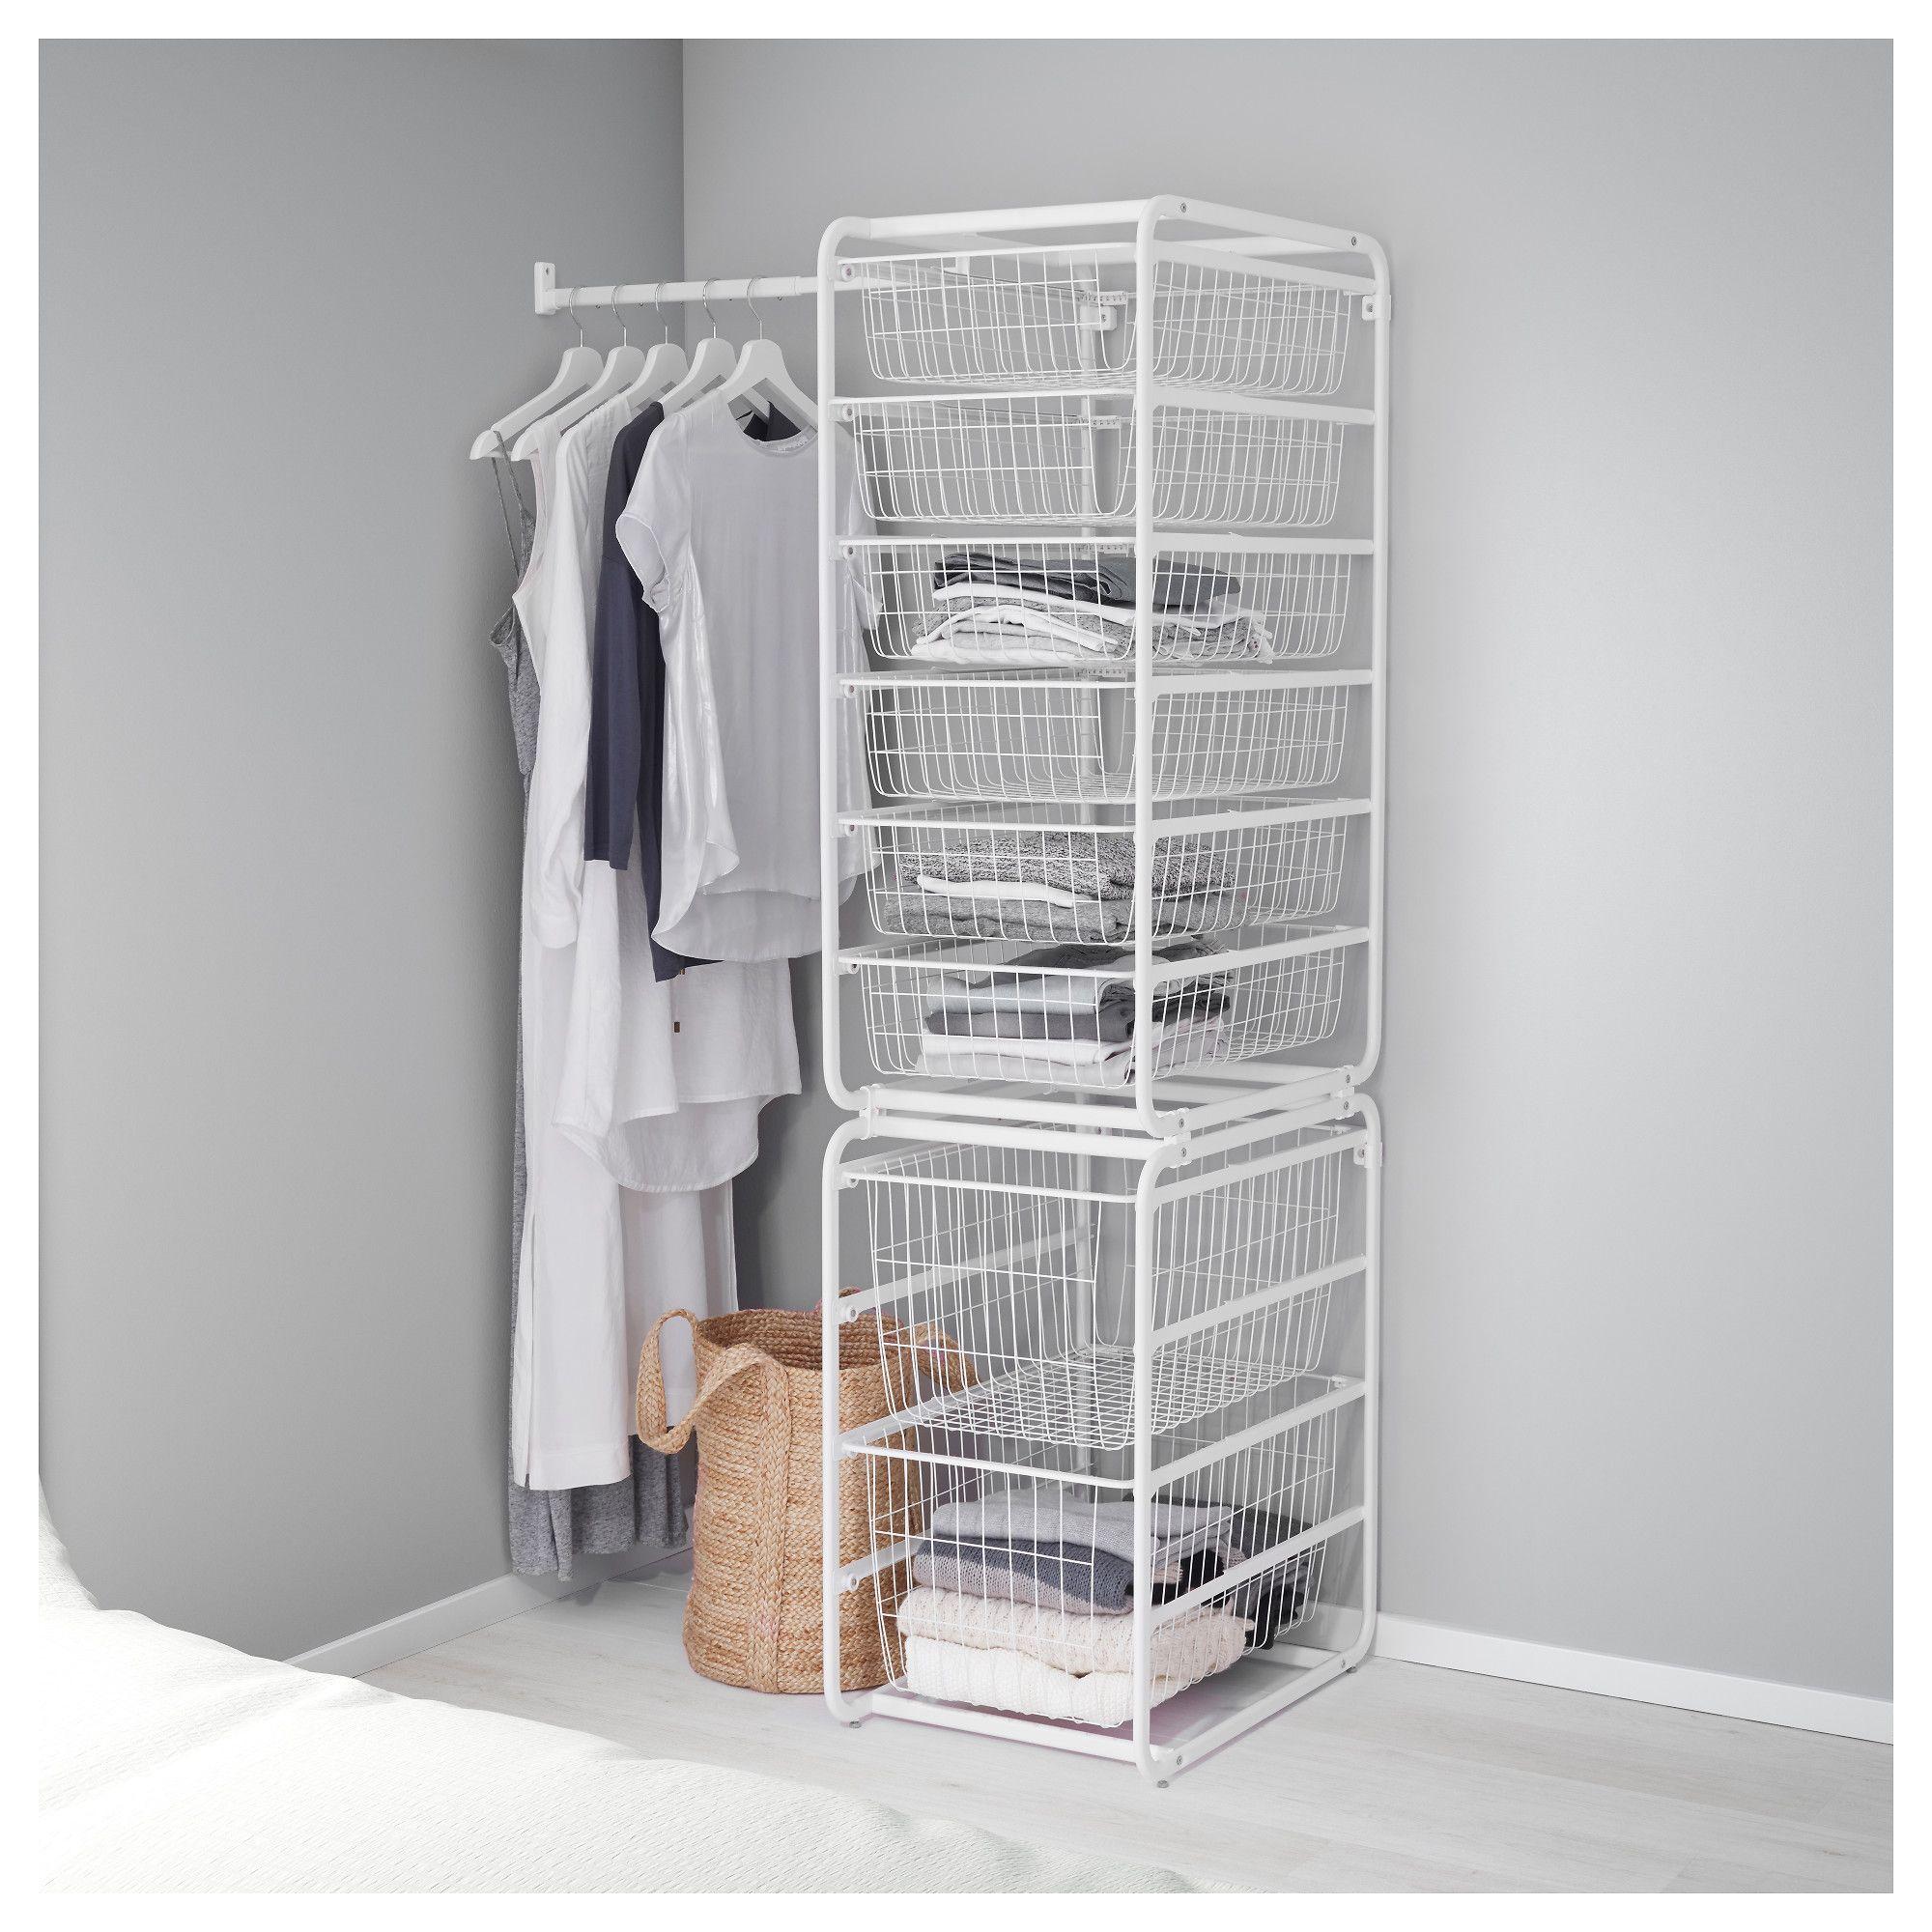 Ikea Us Furniture And Home Furnishings Ikea Algot Clothes Storage Systems Ikea